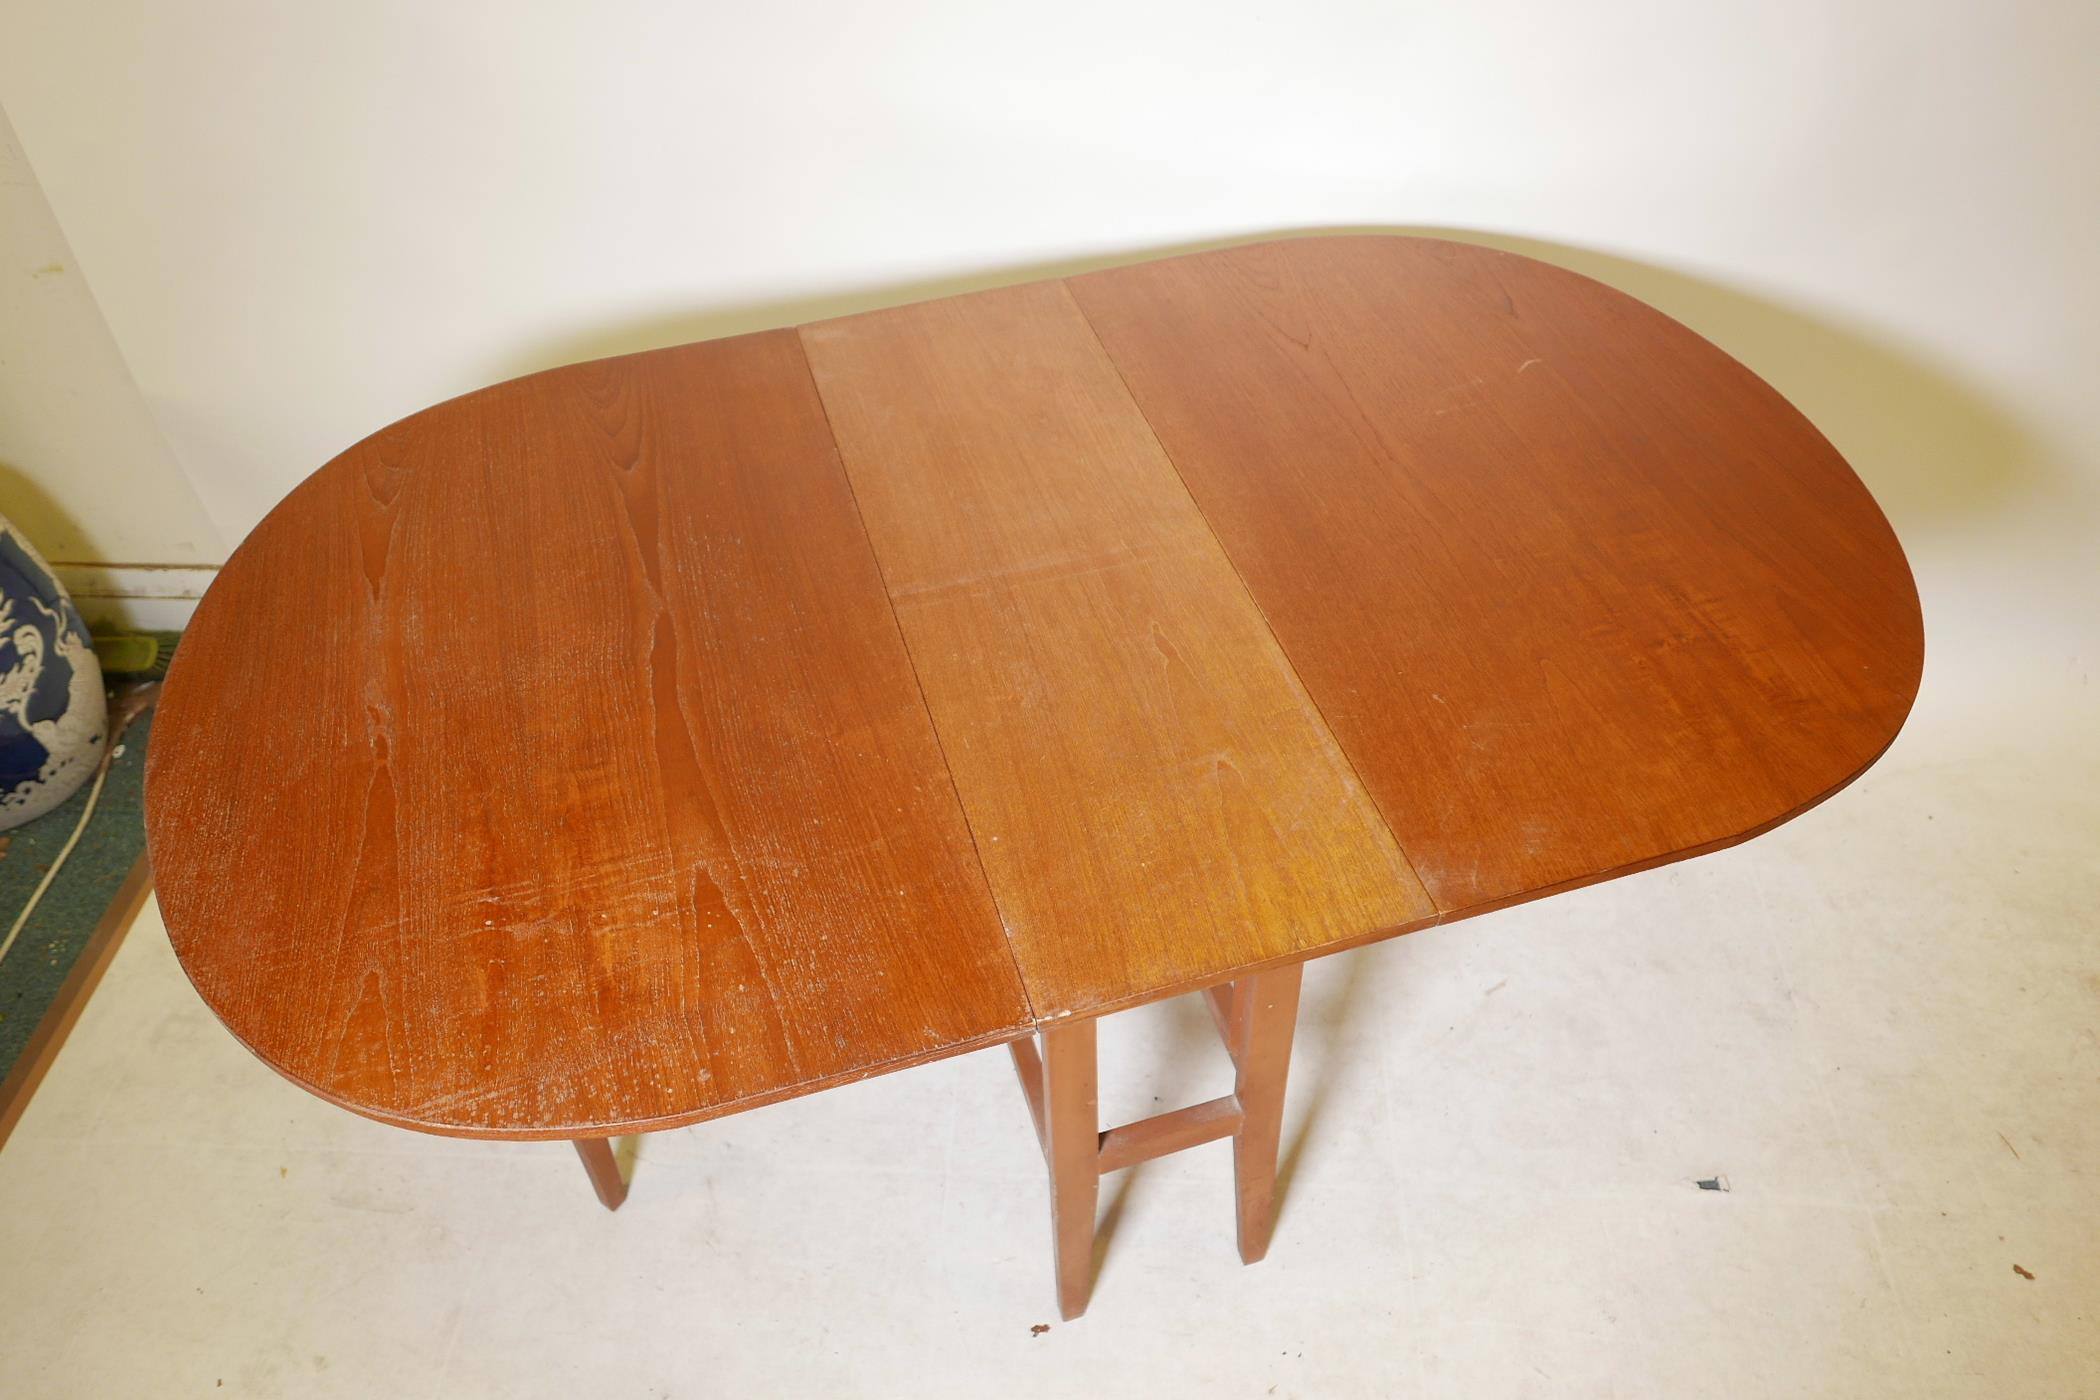 "A 1970s teak gateleg table, 59"" x 35½"", 29"" high extended - Image 3 of 3"